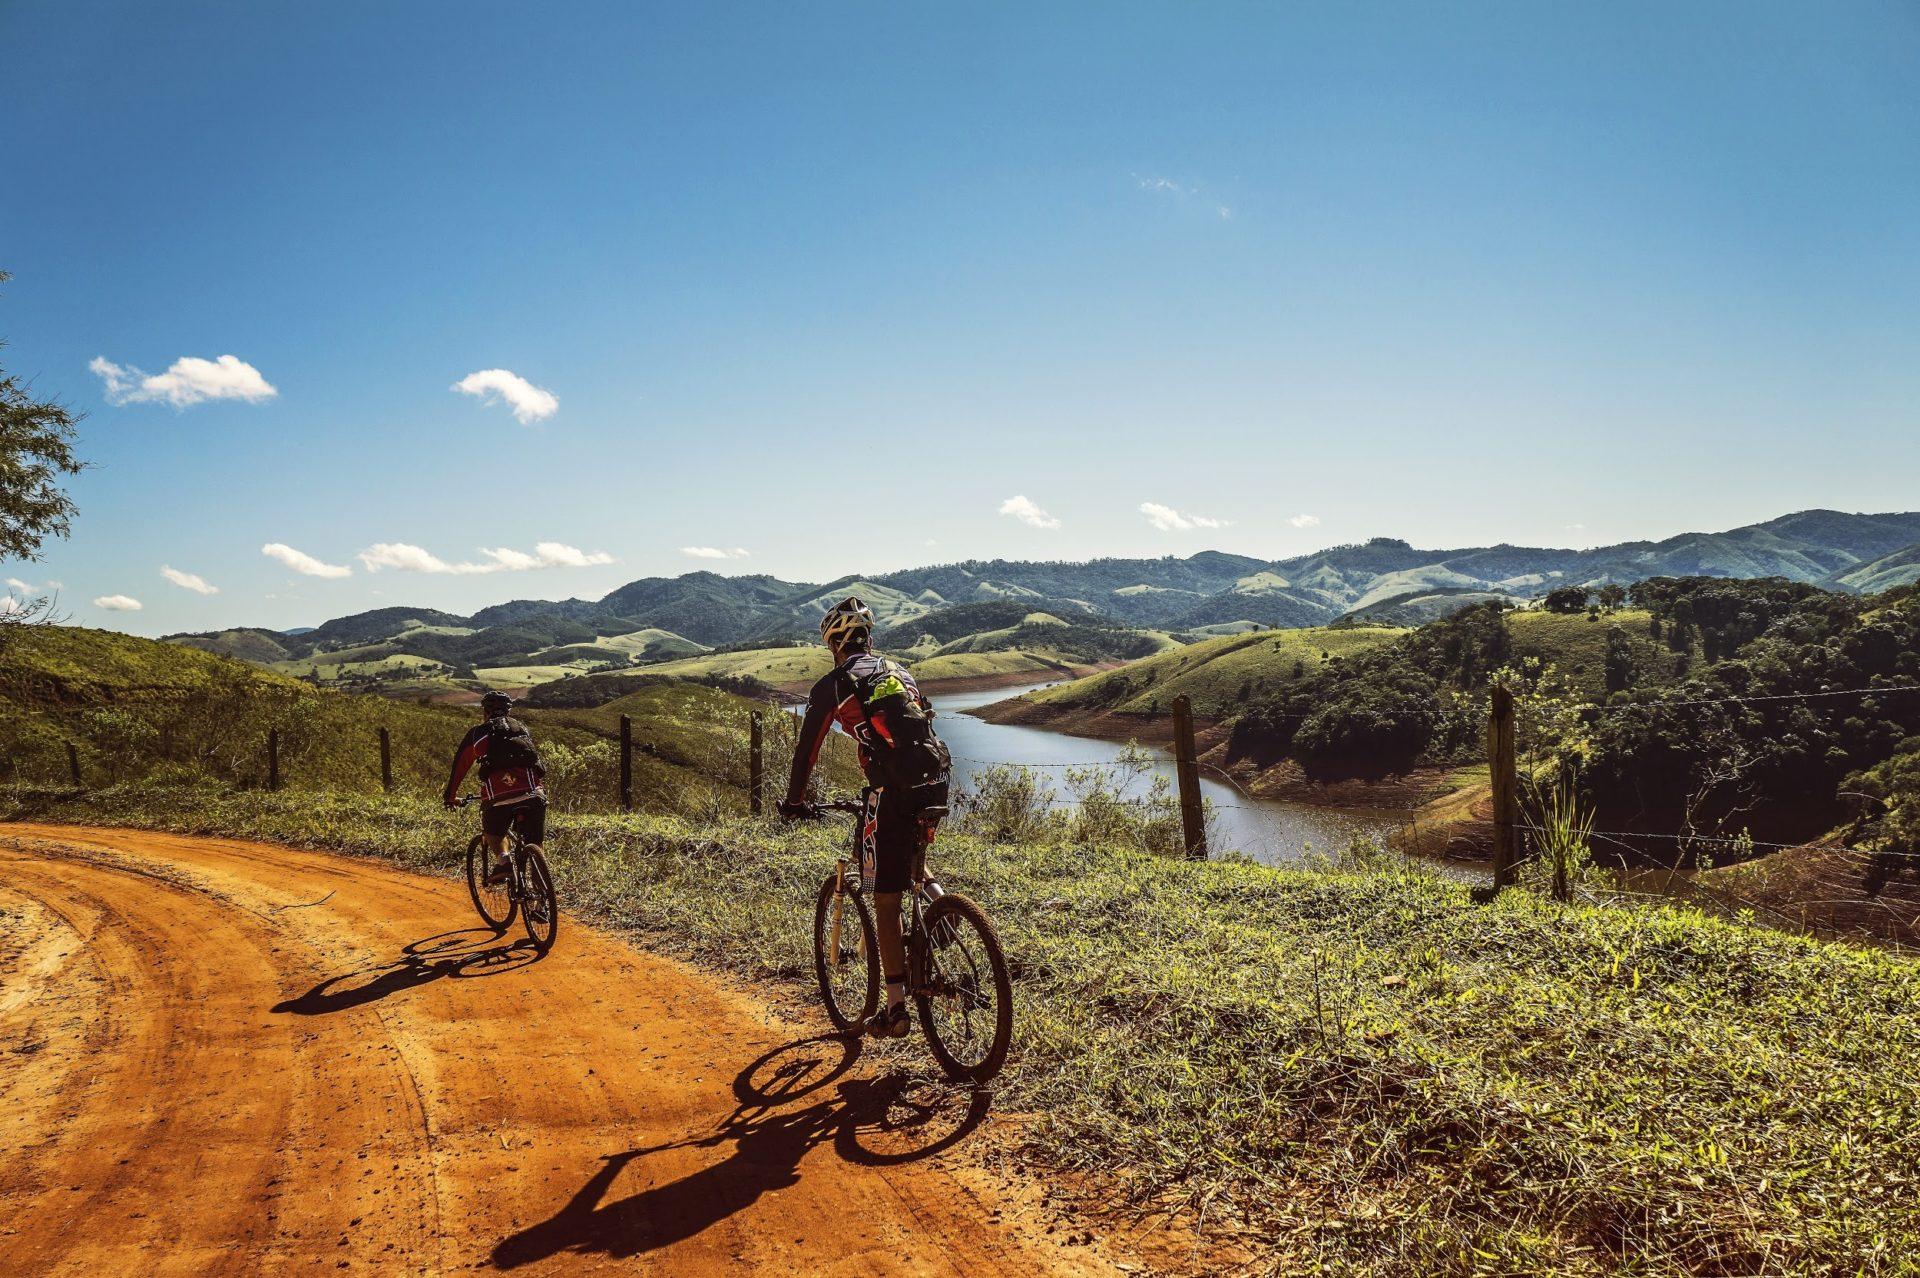 intermediate bicycling trails